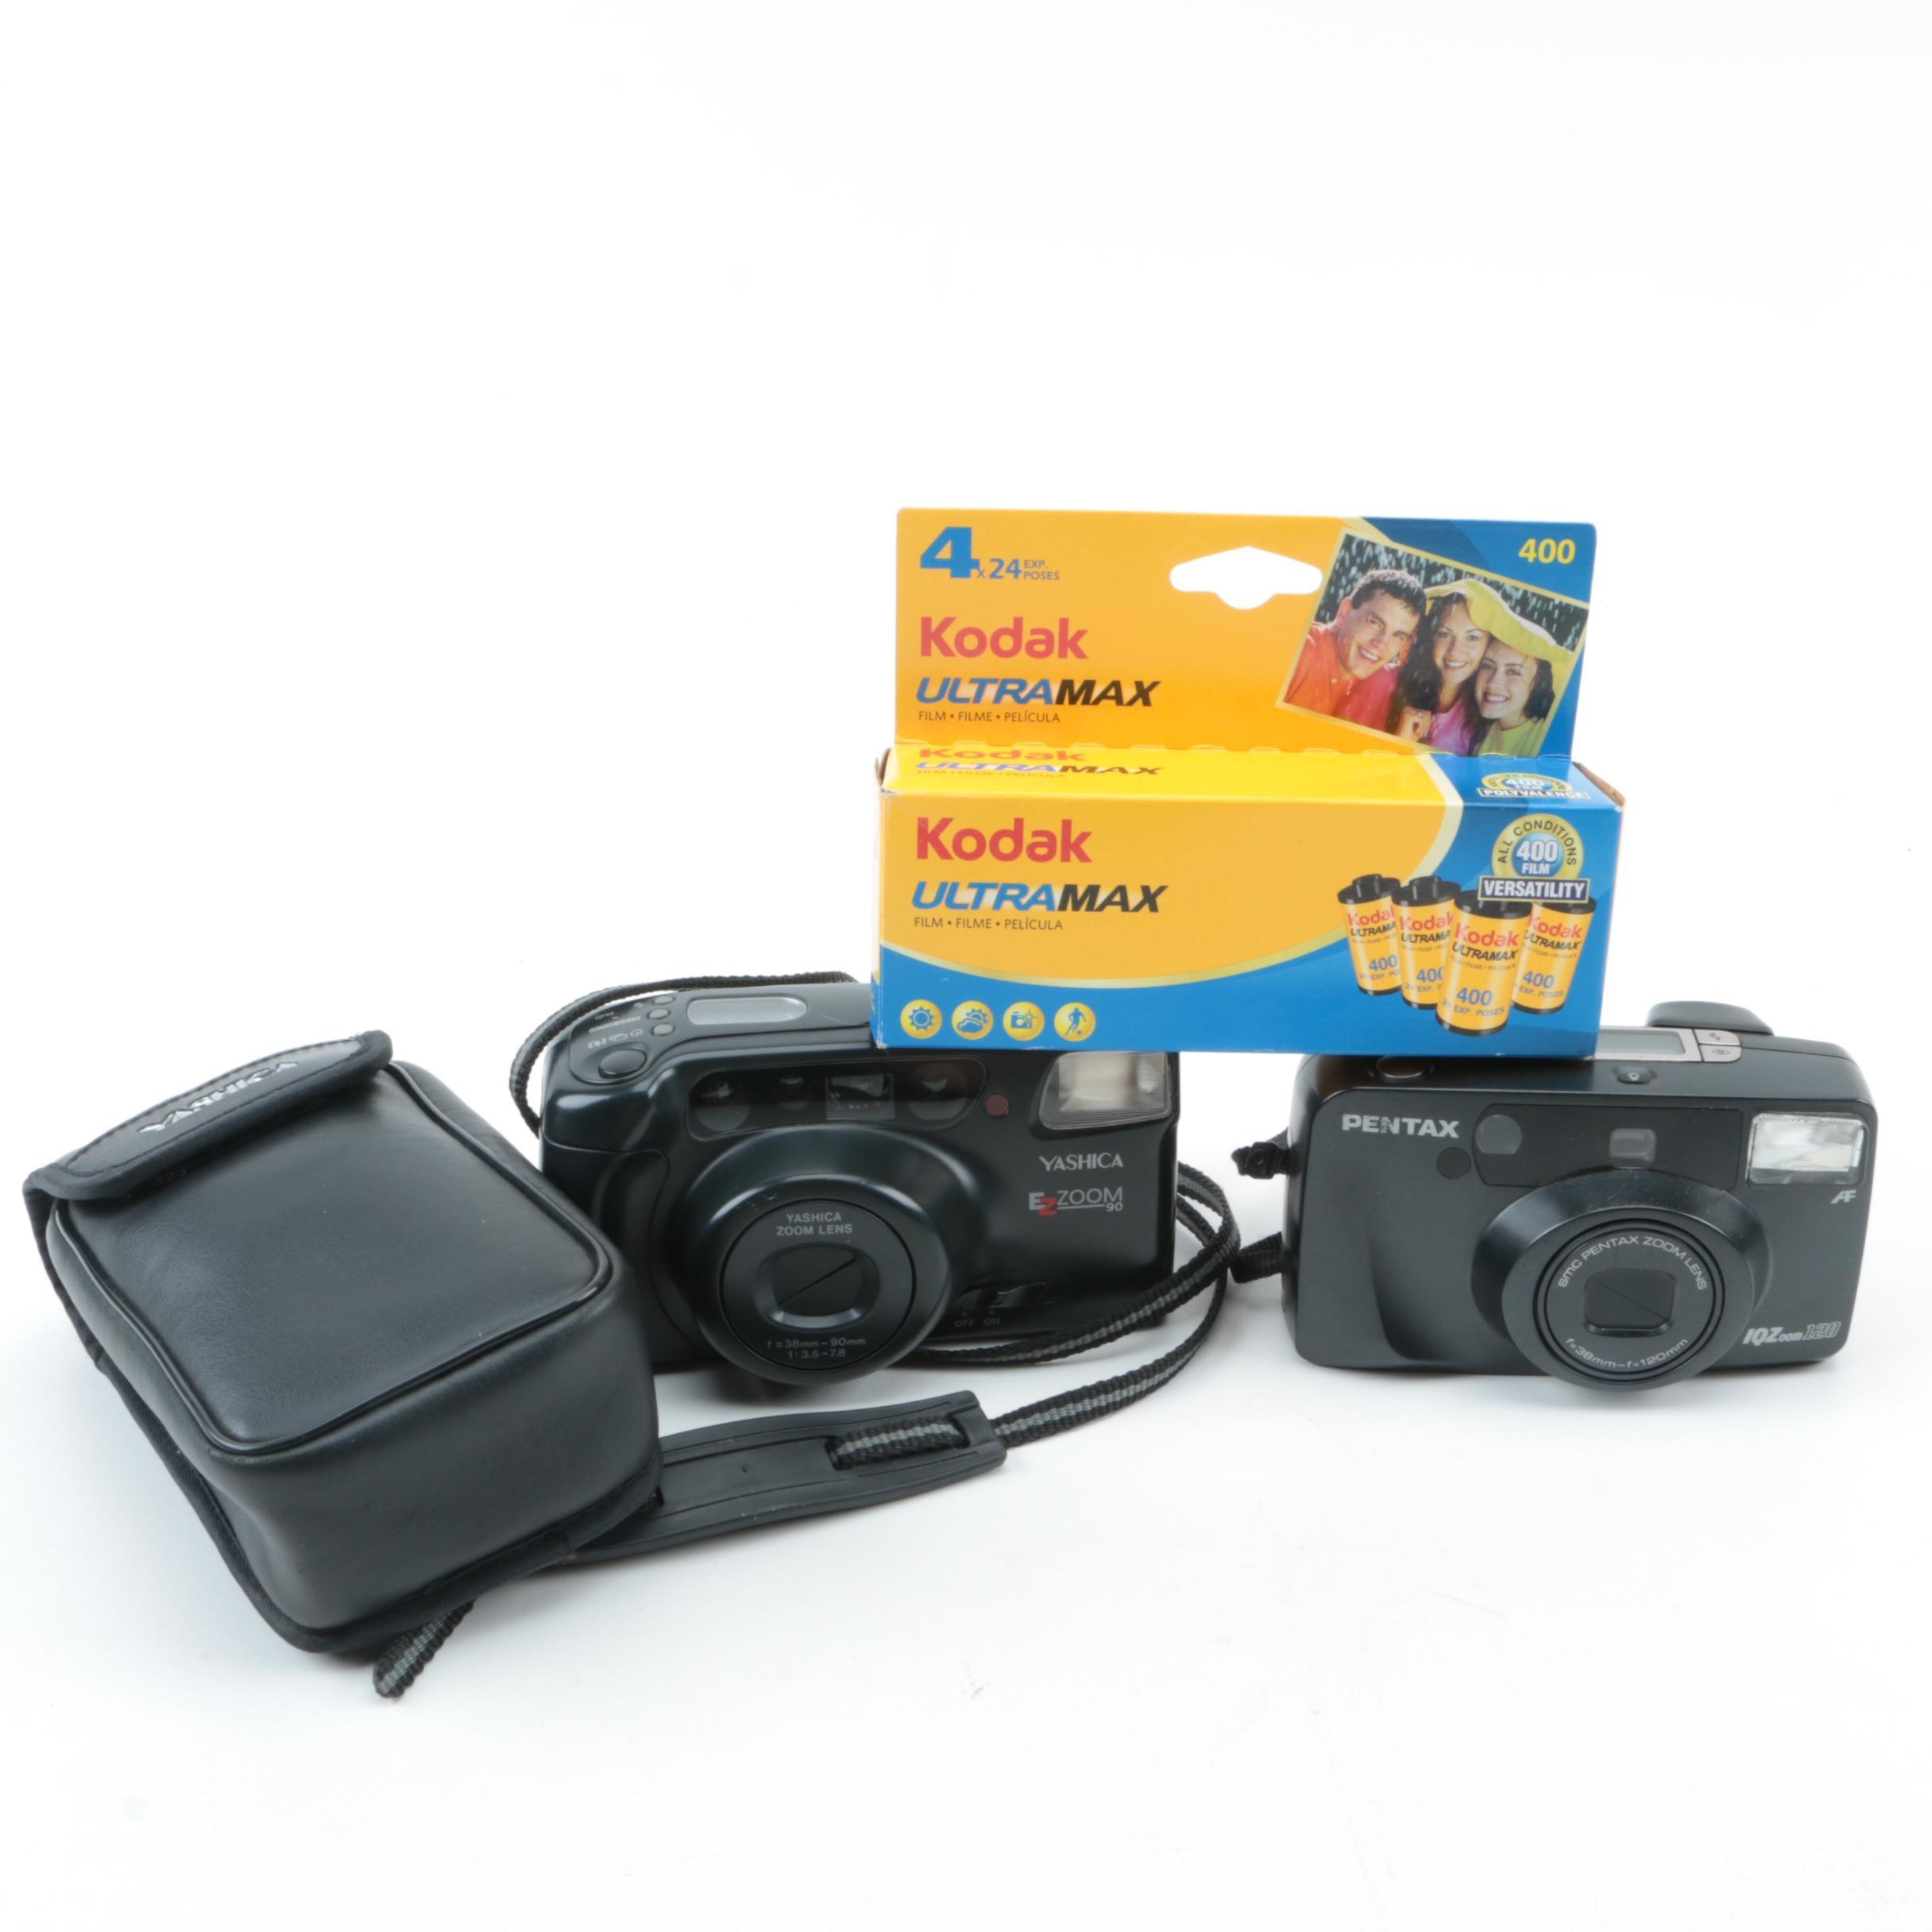 Pentax and Yashica Cameras with Kodak UltraMax Film